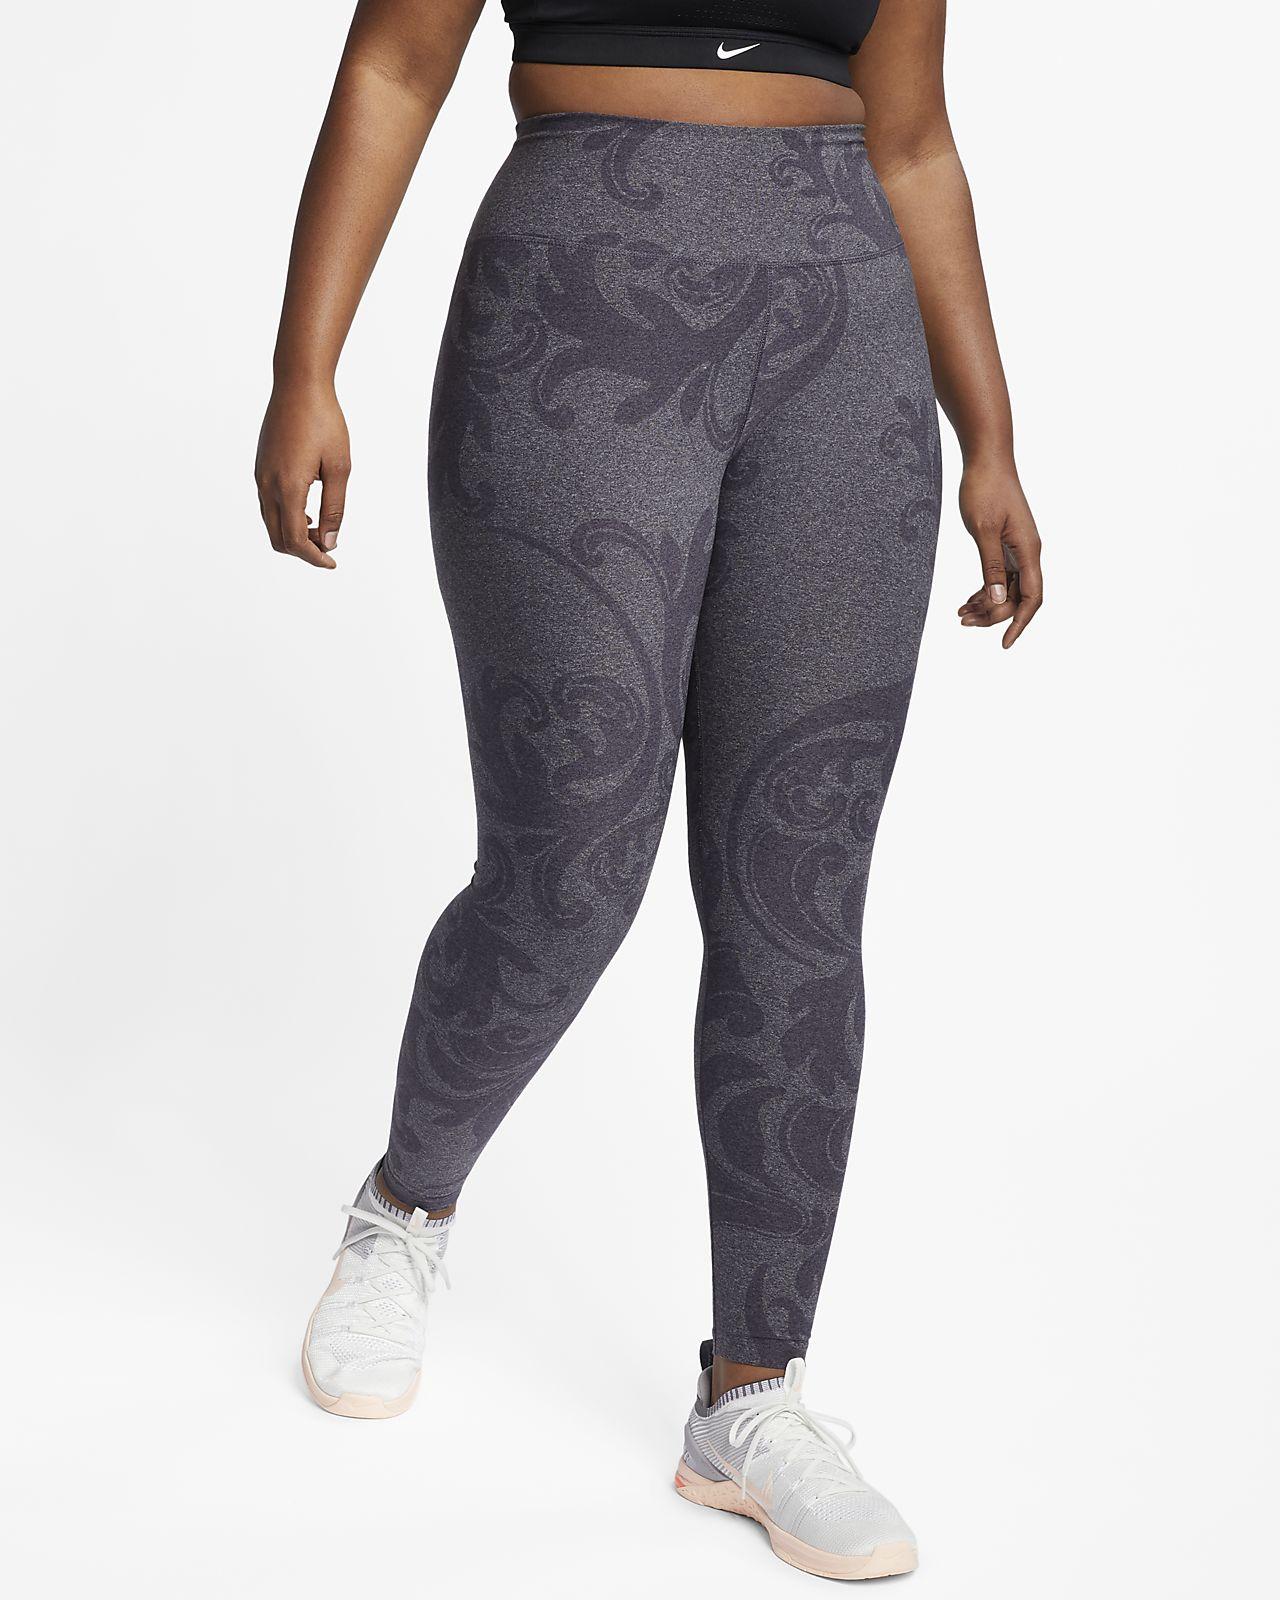 dac4c0a902d42 Nike Dri-FIT Power Studio Women's Printed Training Tights (Plus Size ...